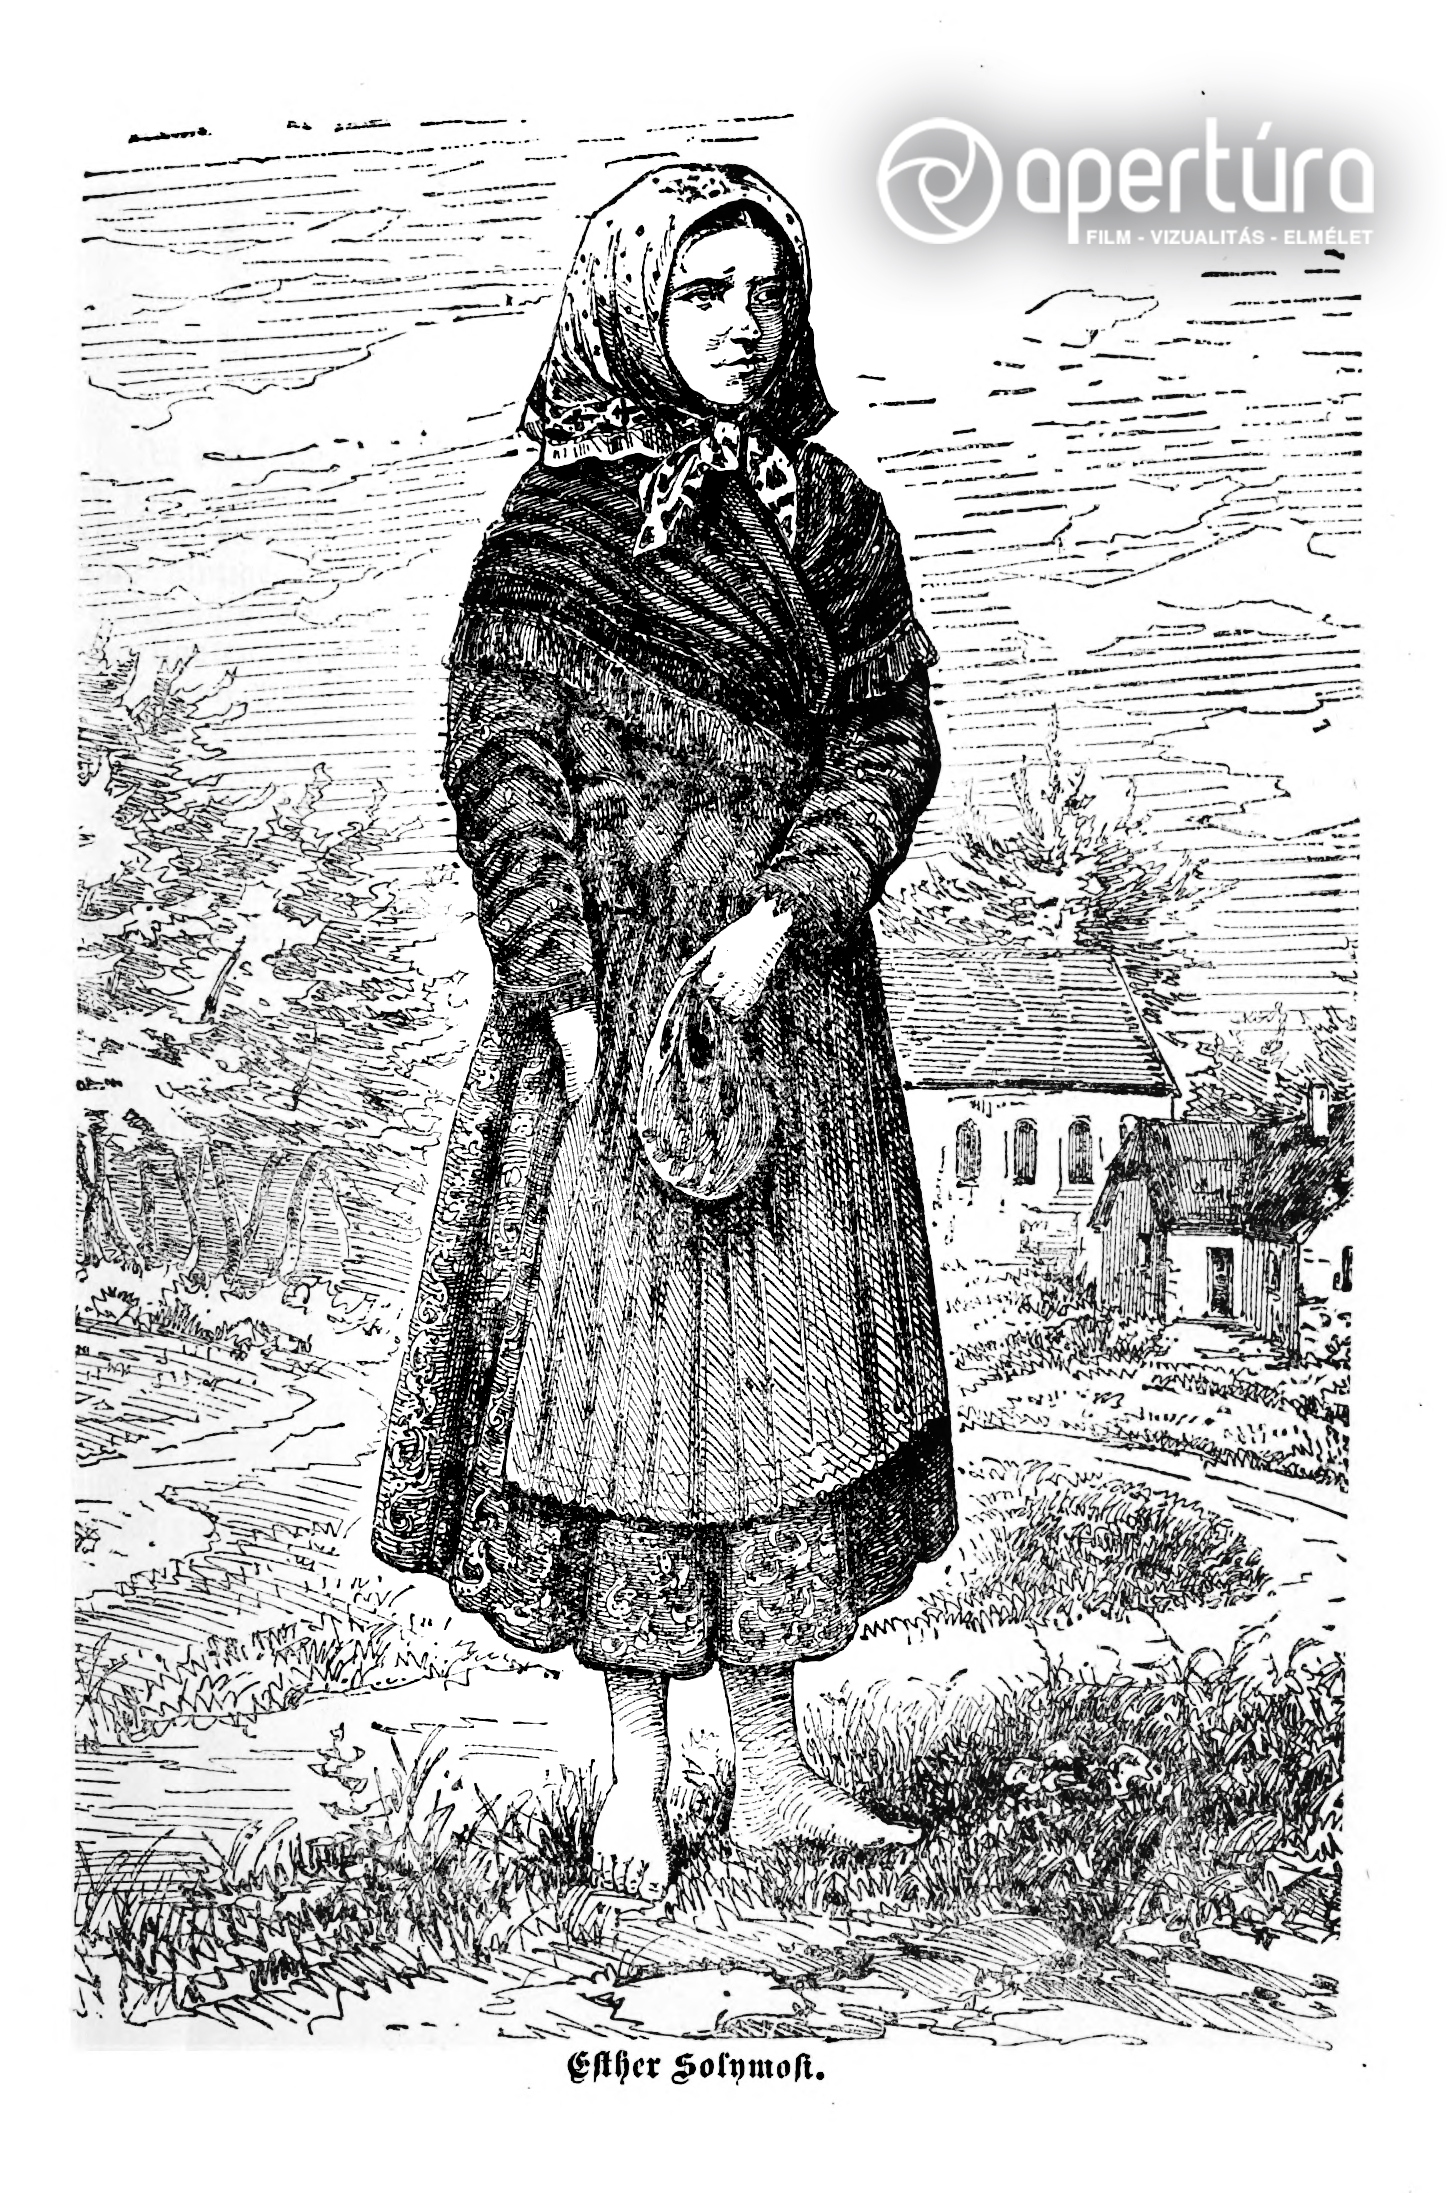 Ismeretlen rajzoló: Solymosi Eszter, 1883. Megjelent: Der Blutprozess von Tisza Eszlár in Ungarn. New York, Schnitzer bros., 1883. s. p